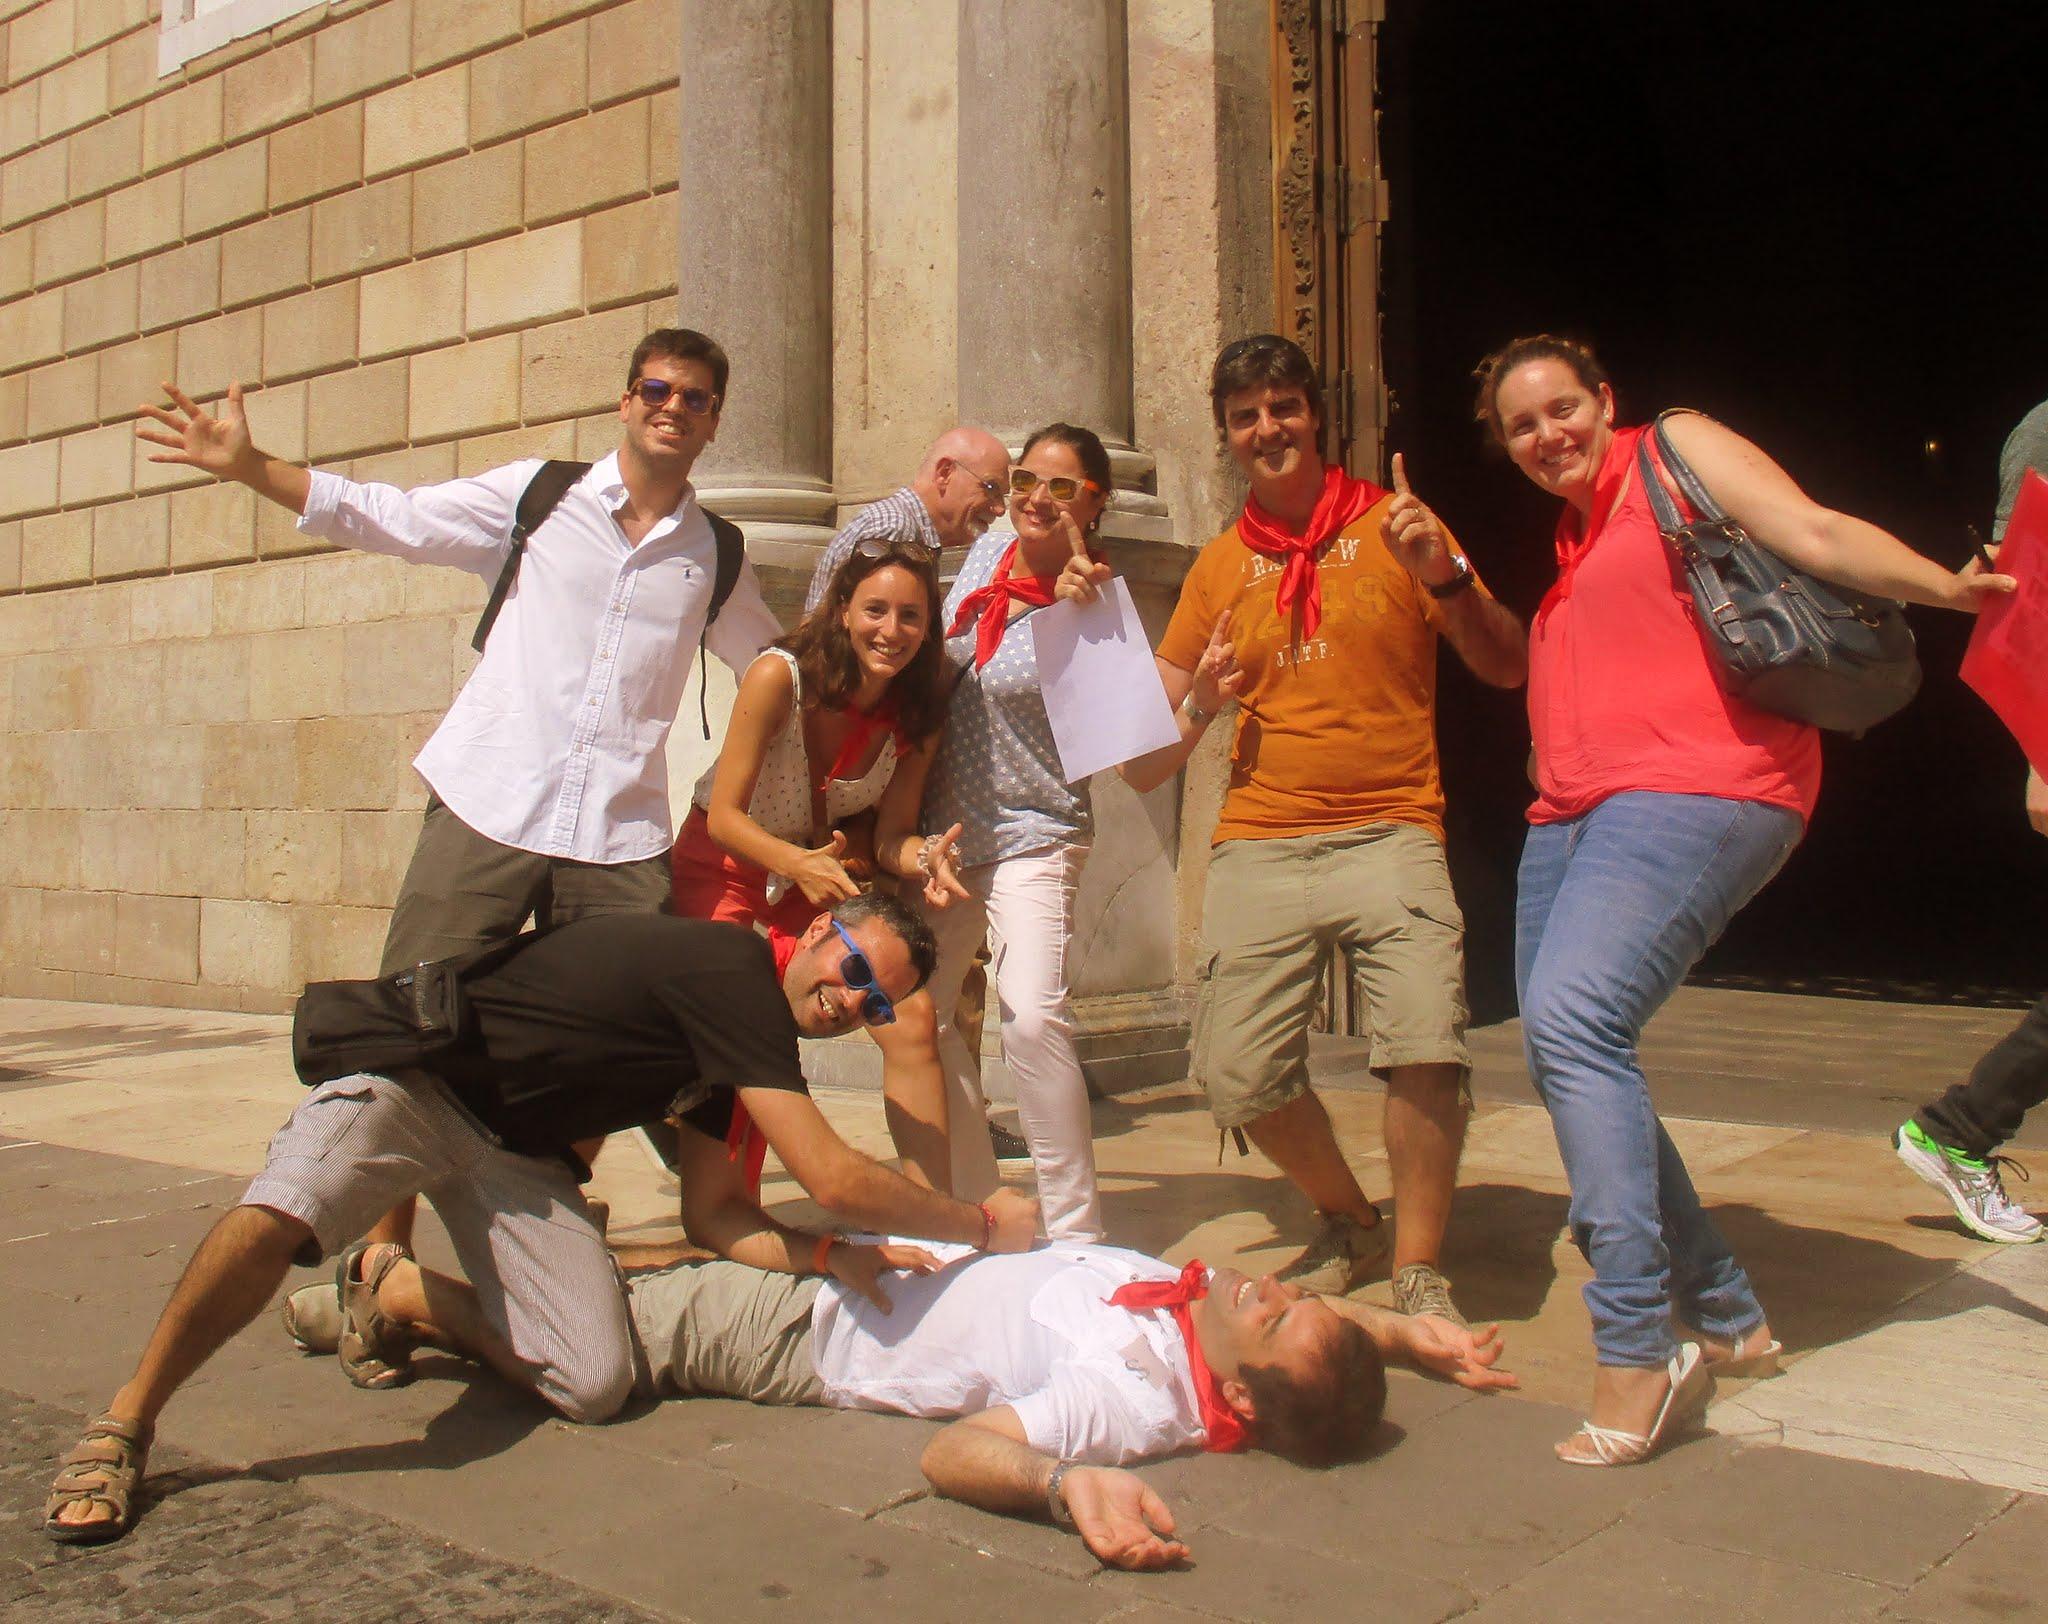 fun corporate activity in barcelona